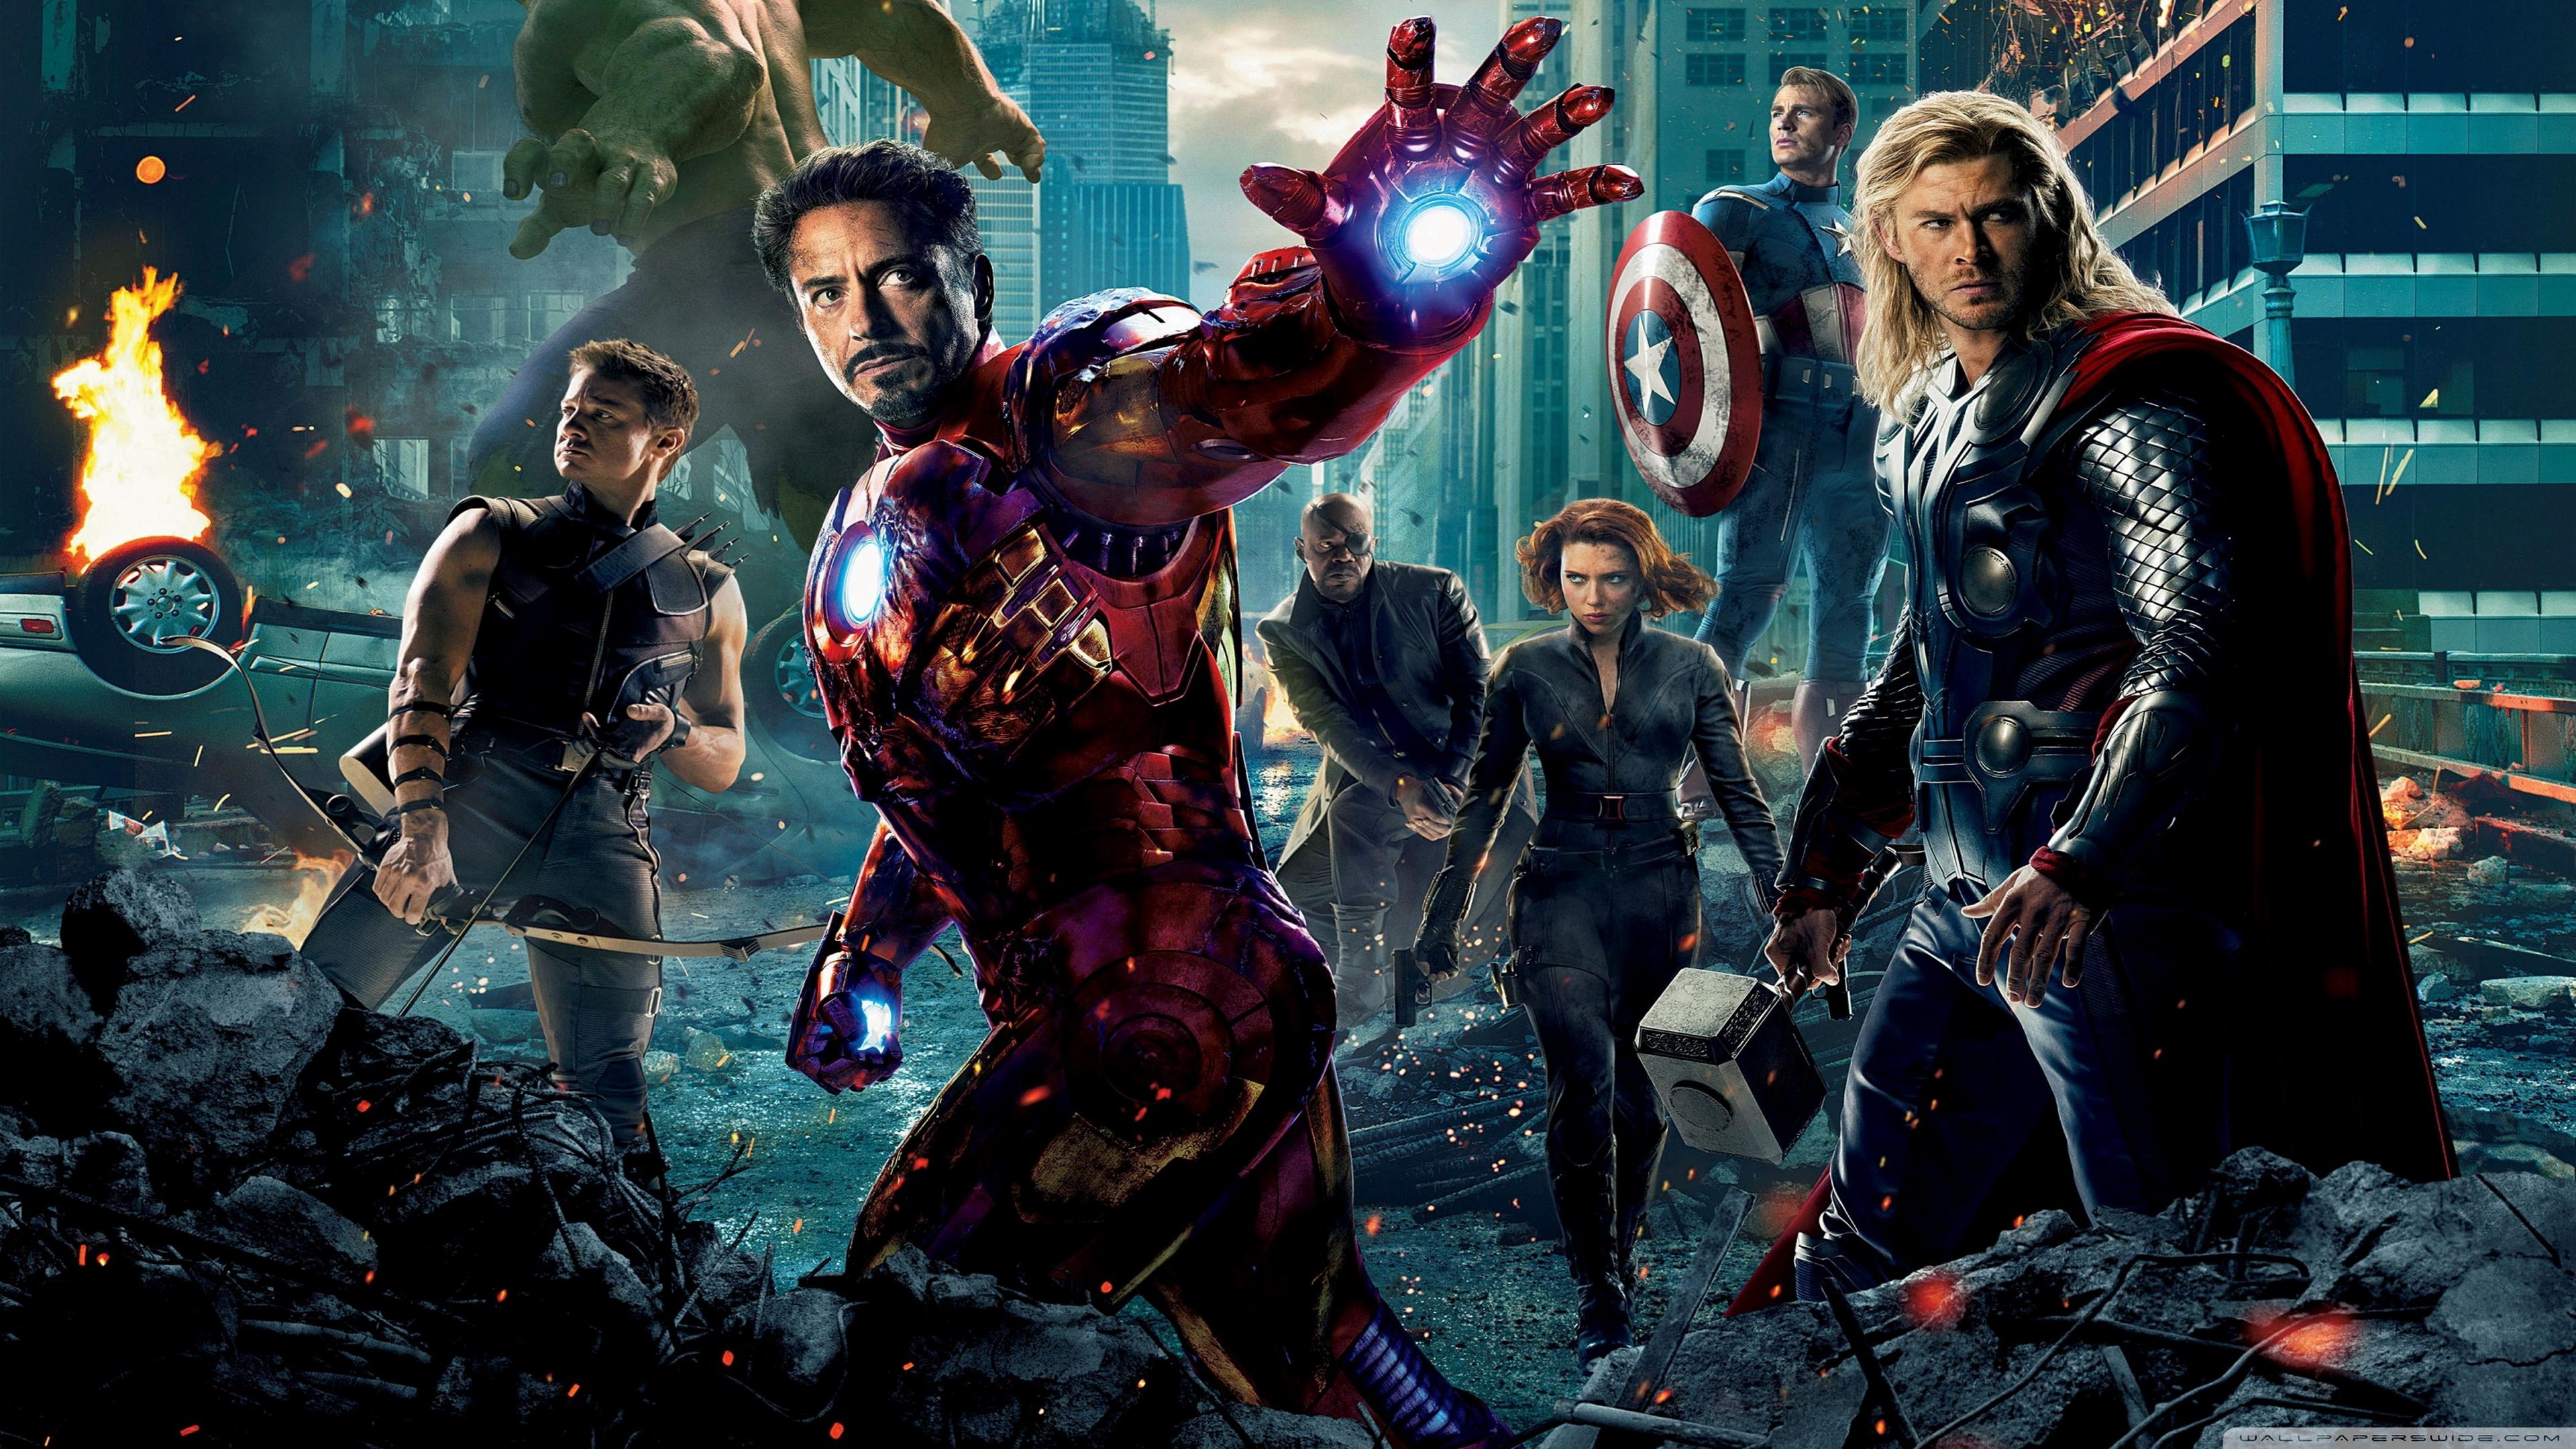 Avengers Ultra HD 4k Wallpaper   HD Wallpapers Ultra HD Wallpapers 3840x2160